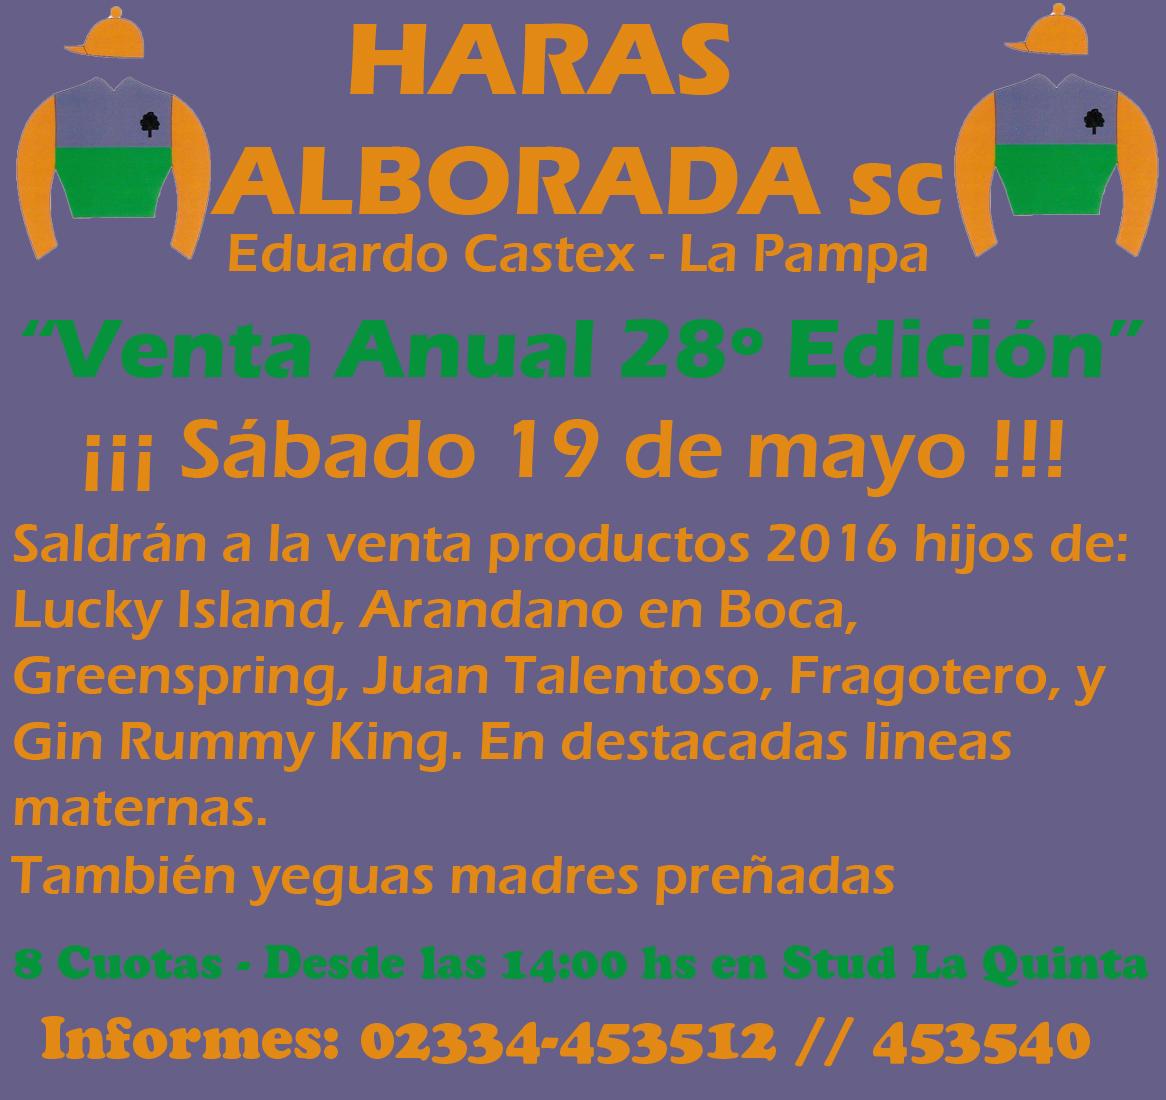 HARAS ALBORADA